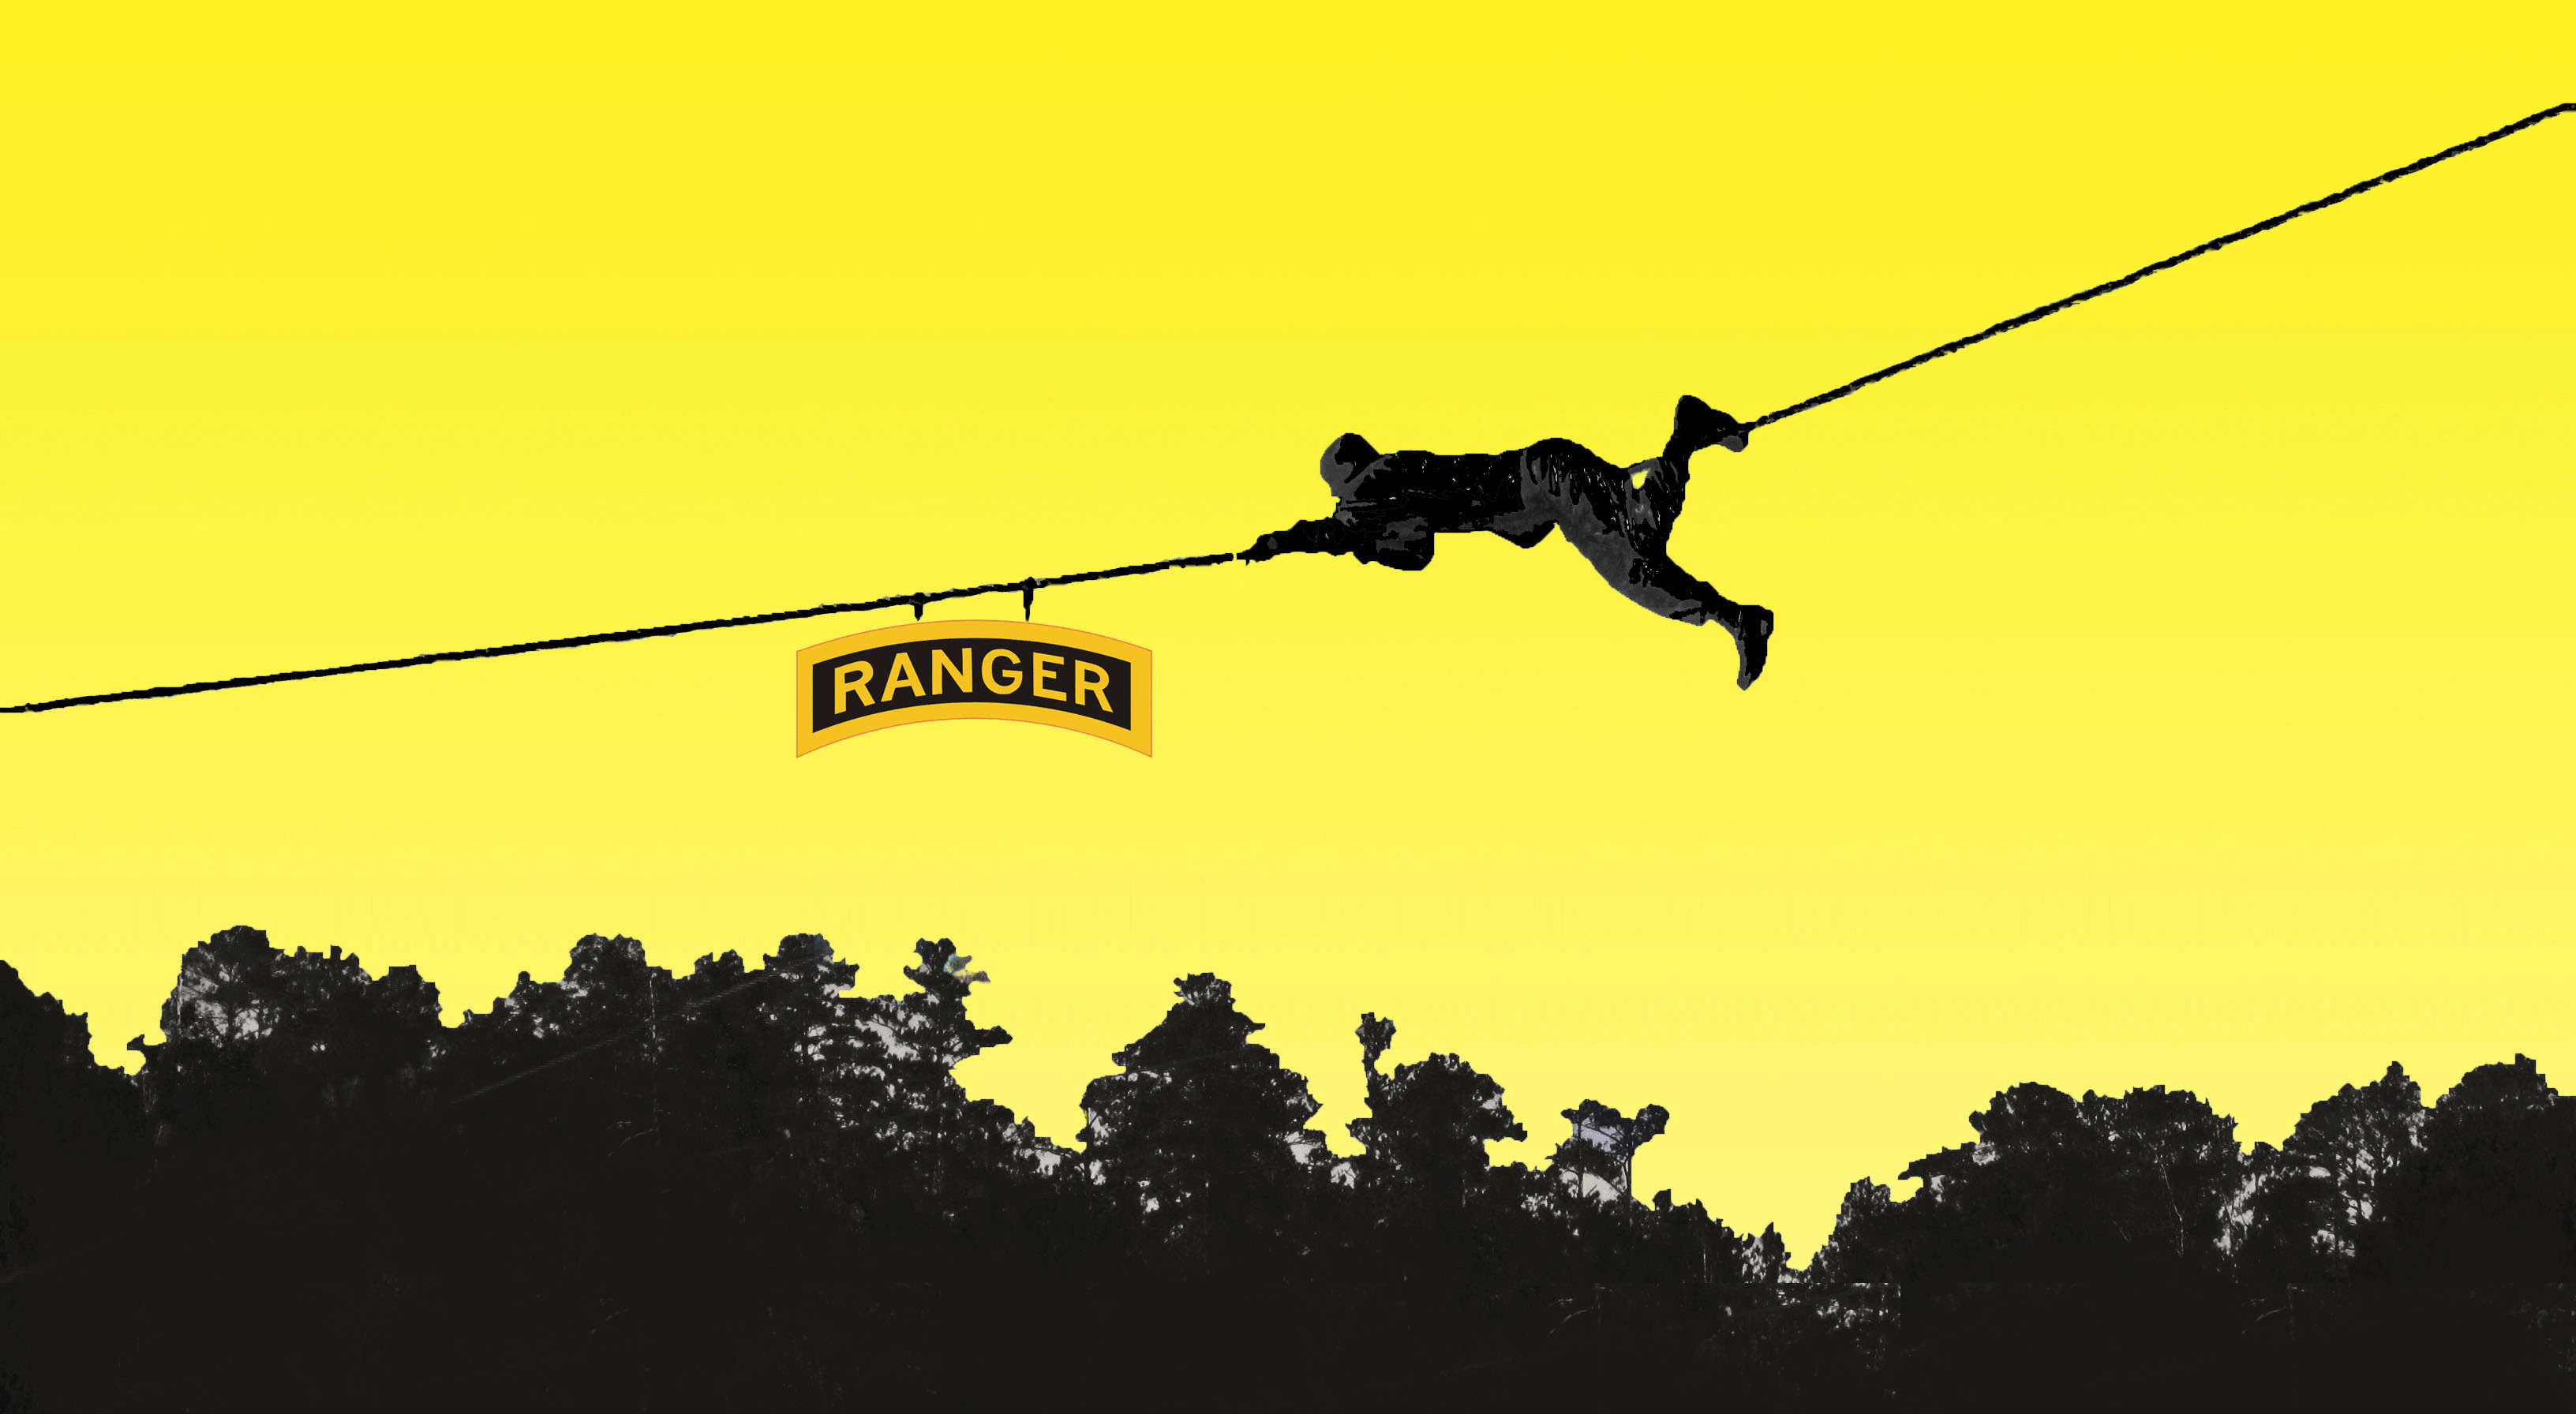 Airborne Ranger Logo Wallpaper Wallpapertag